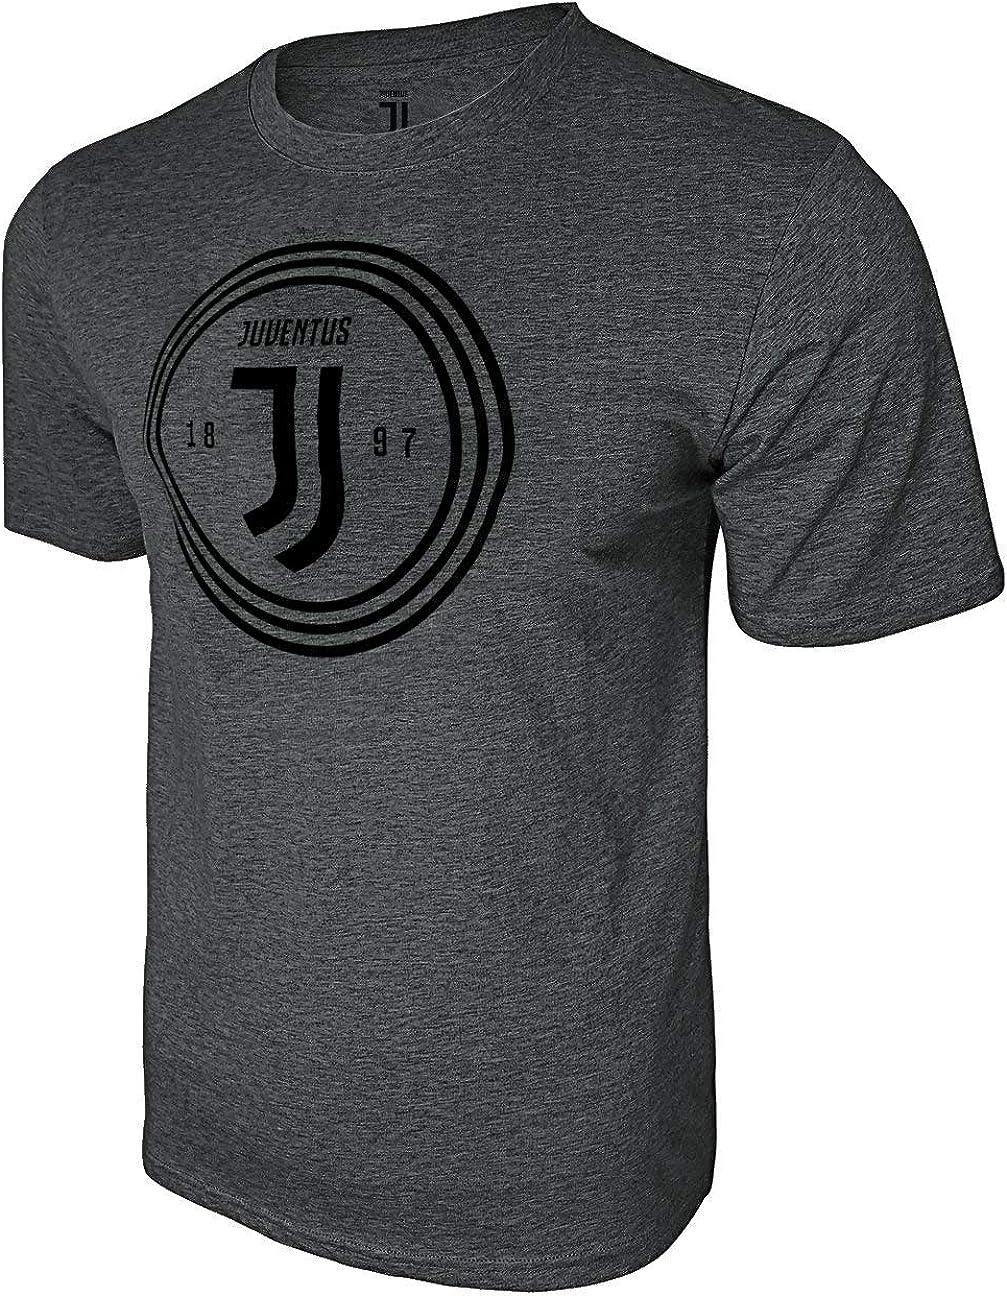 Icon Sports Liverpool FC Liverbird Logo T-Shirt